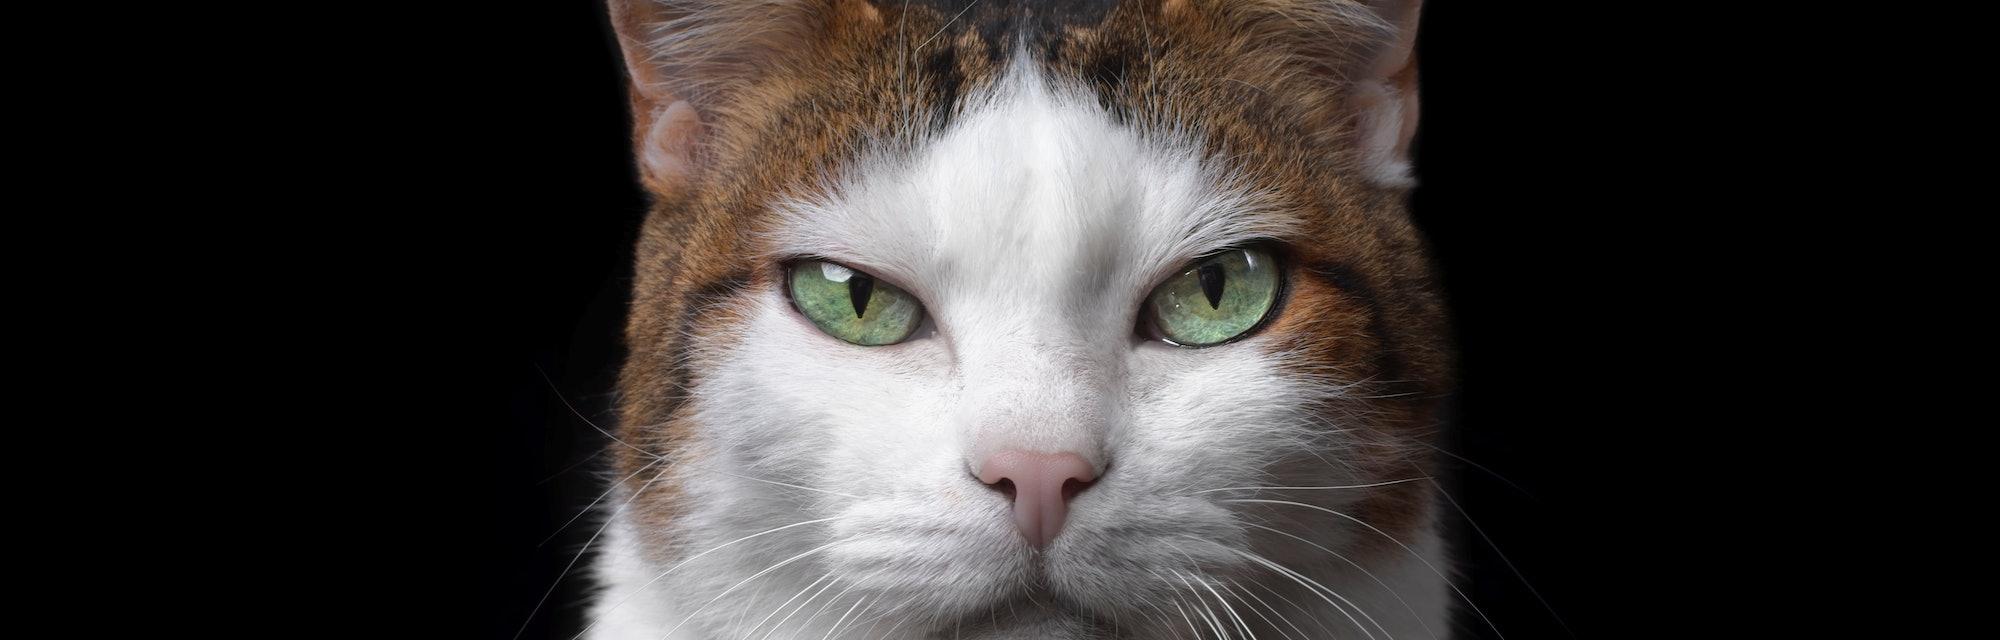 Grumpy pet cat